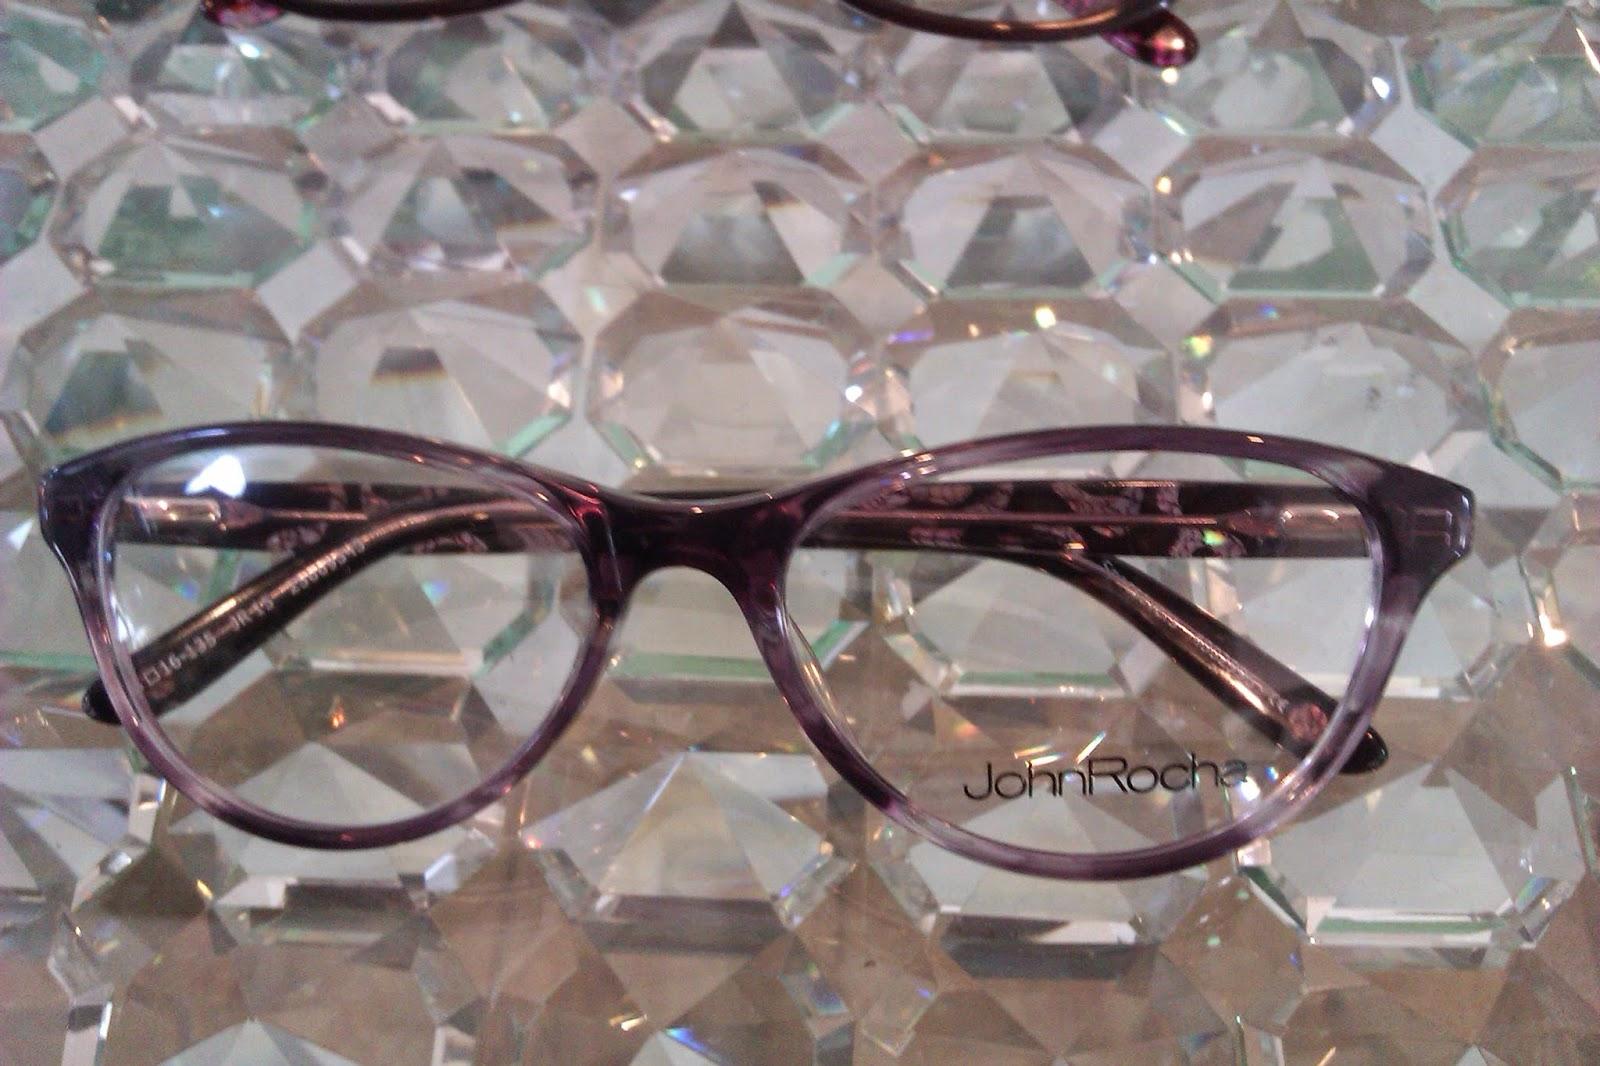 a384fffaf292 frumpy to funky  Sneak peek at the new Designer Eyewear Collections ...